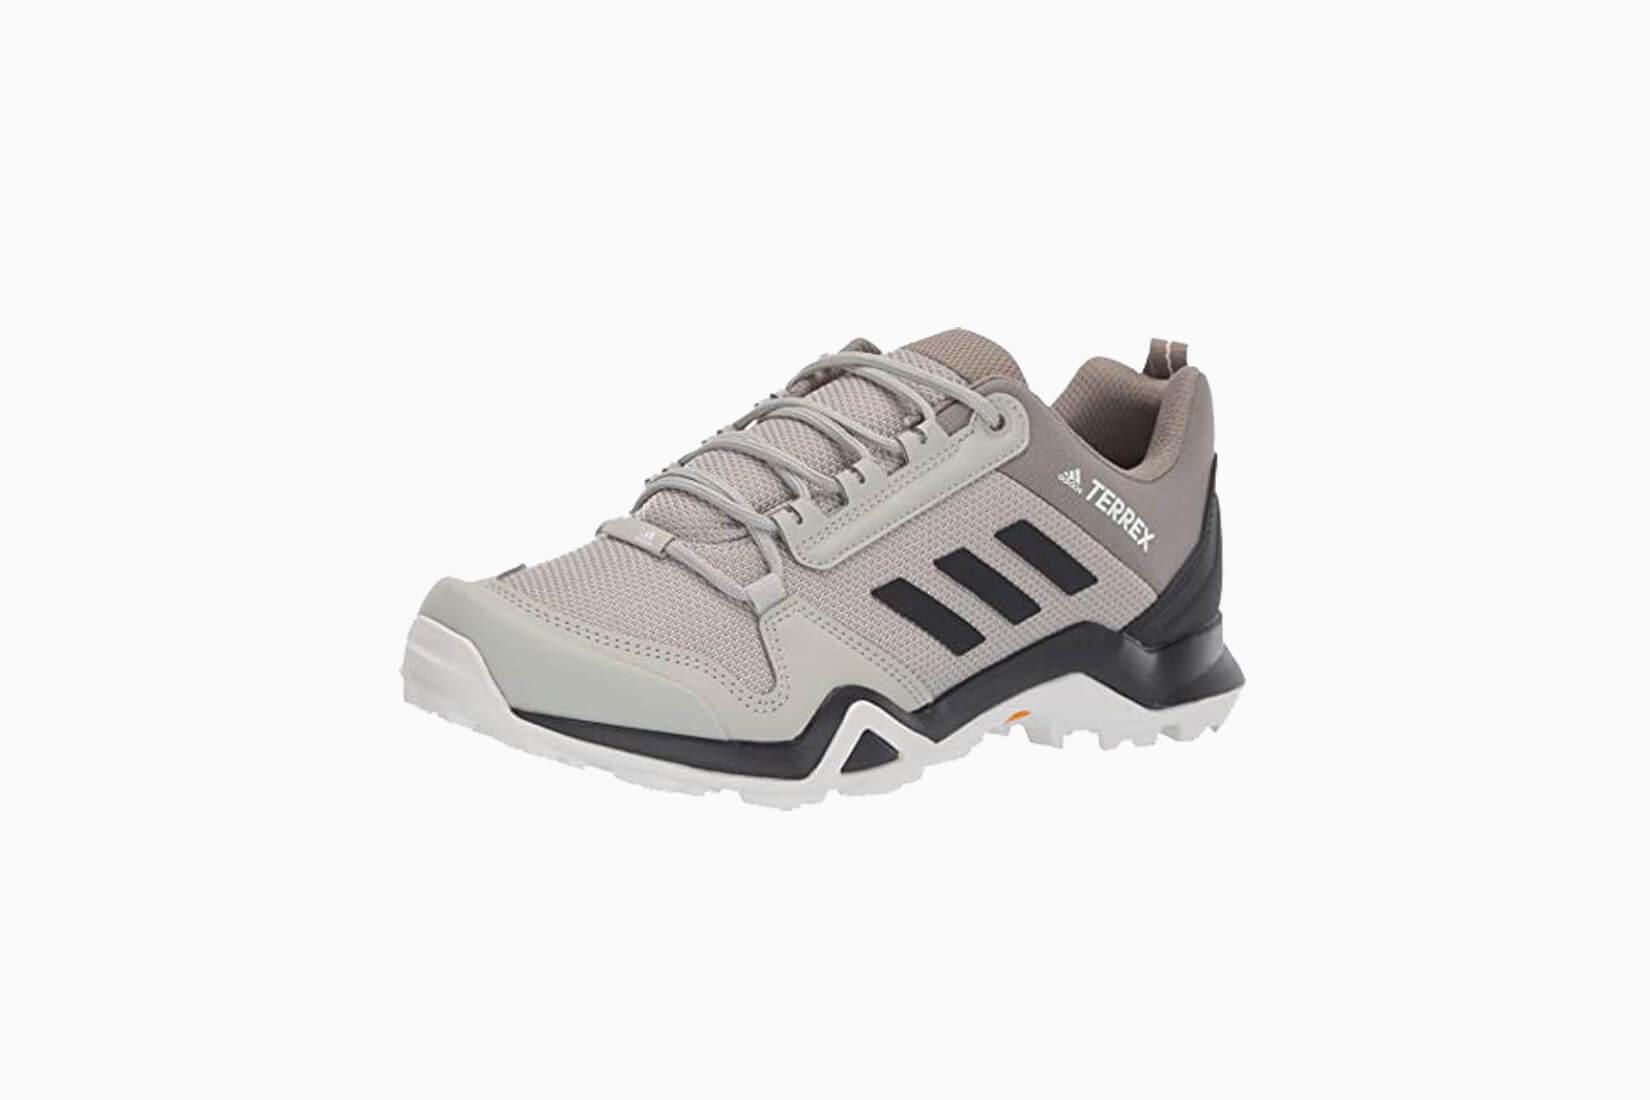 best workout shoes women adidas terrex review - Luxe Digital